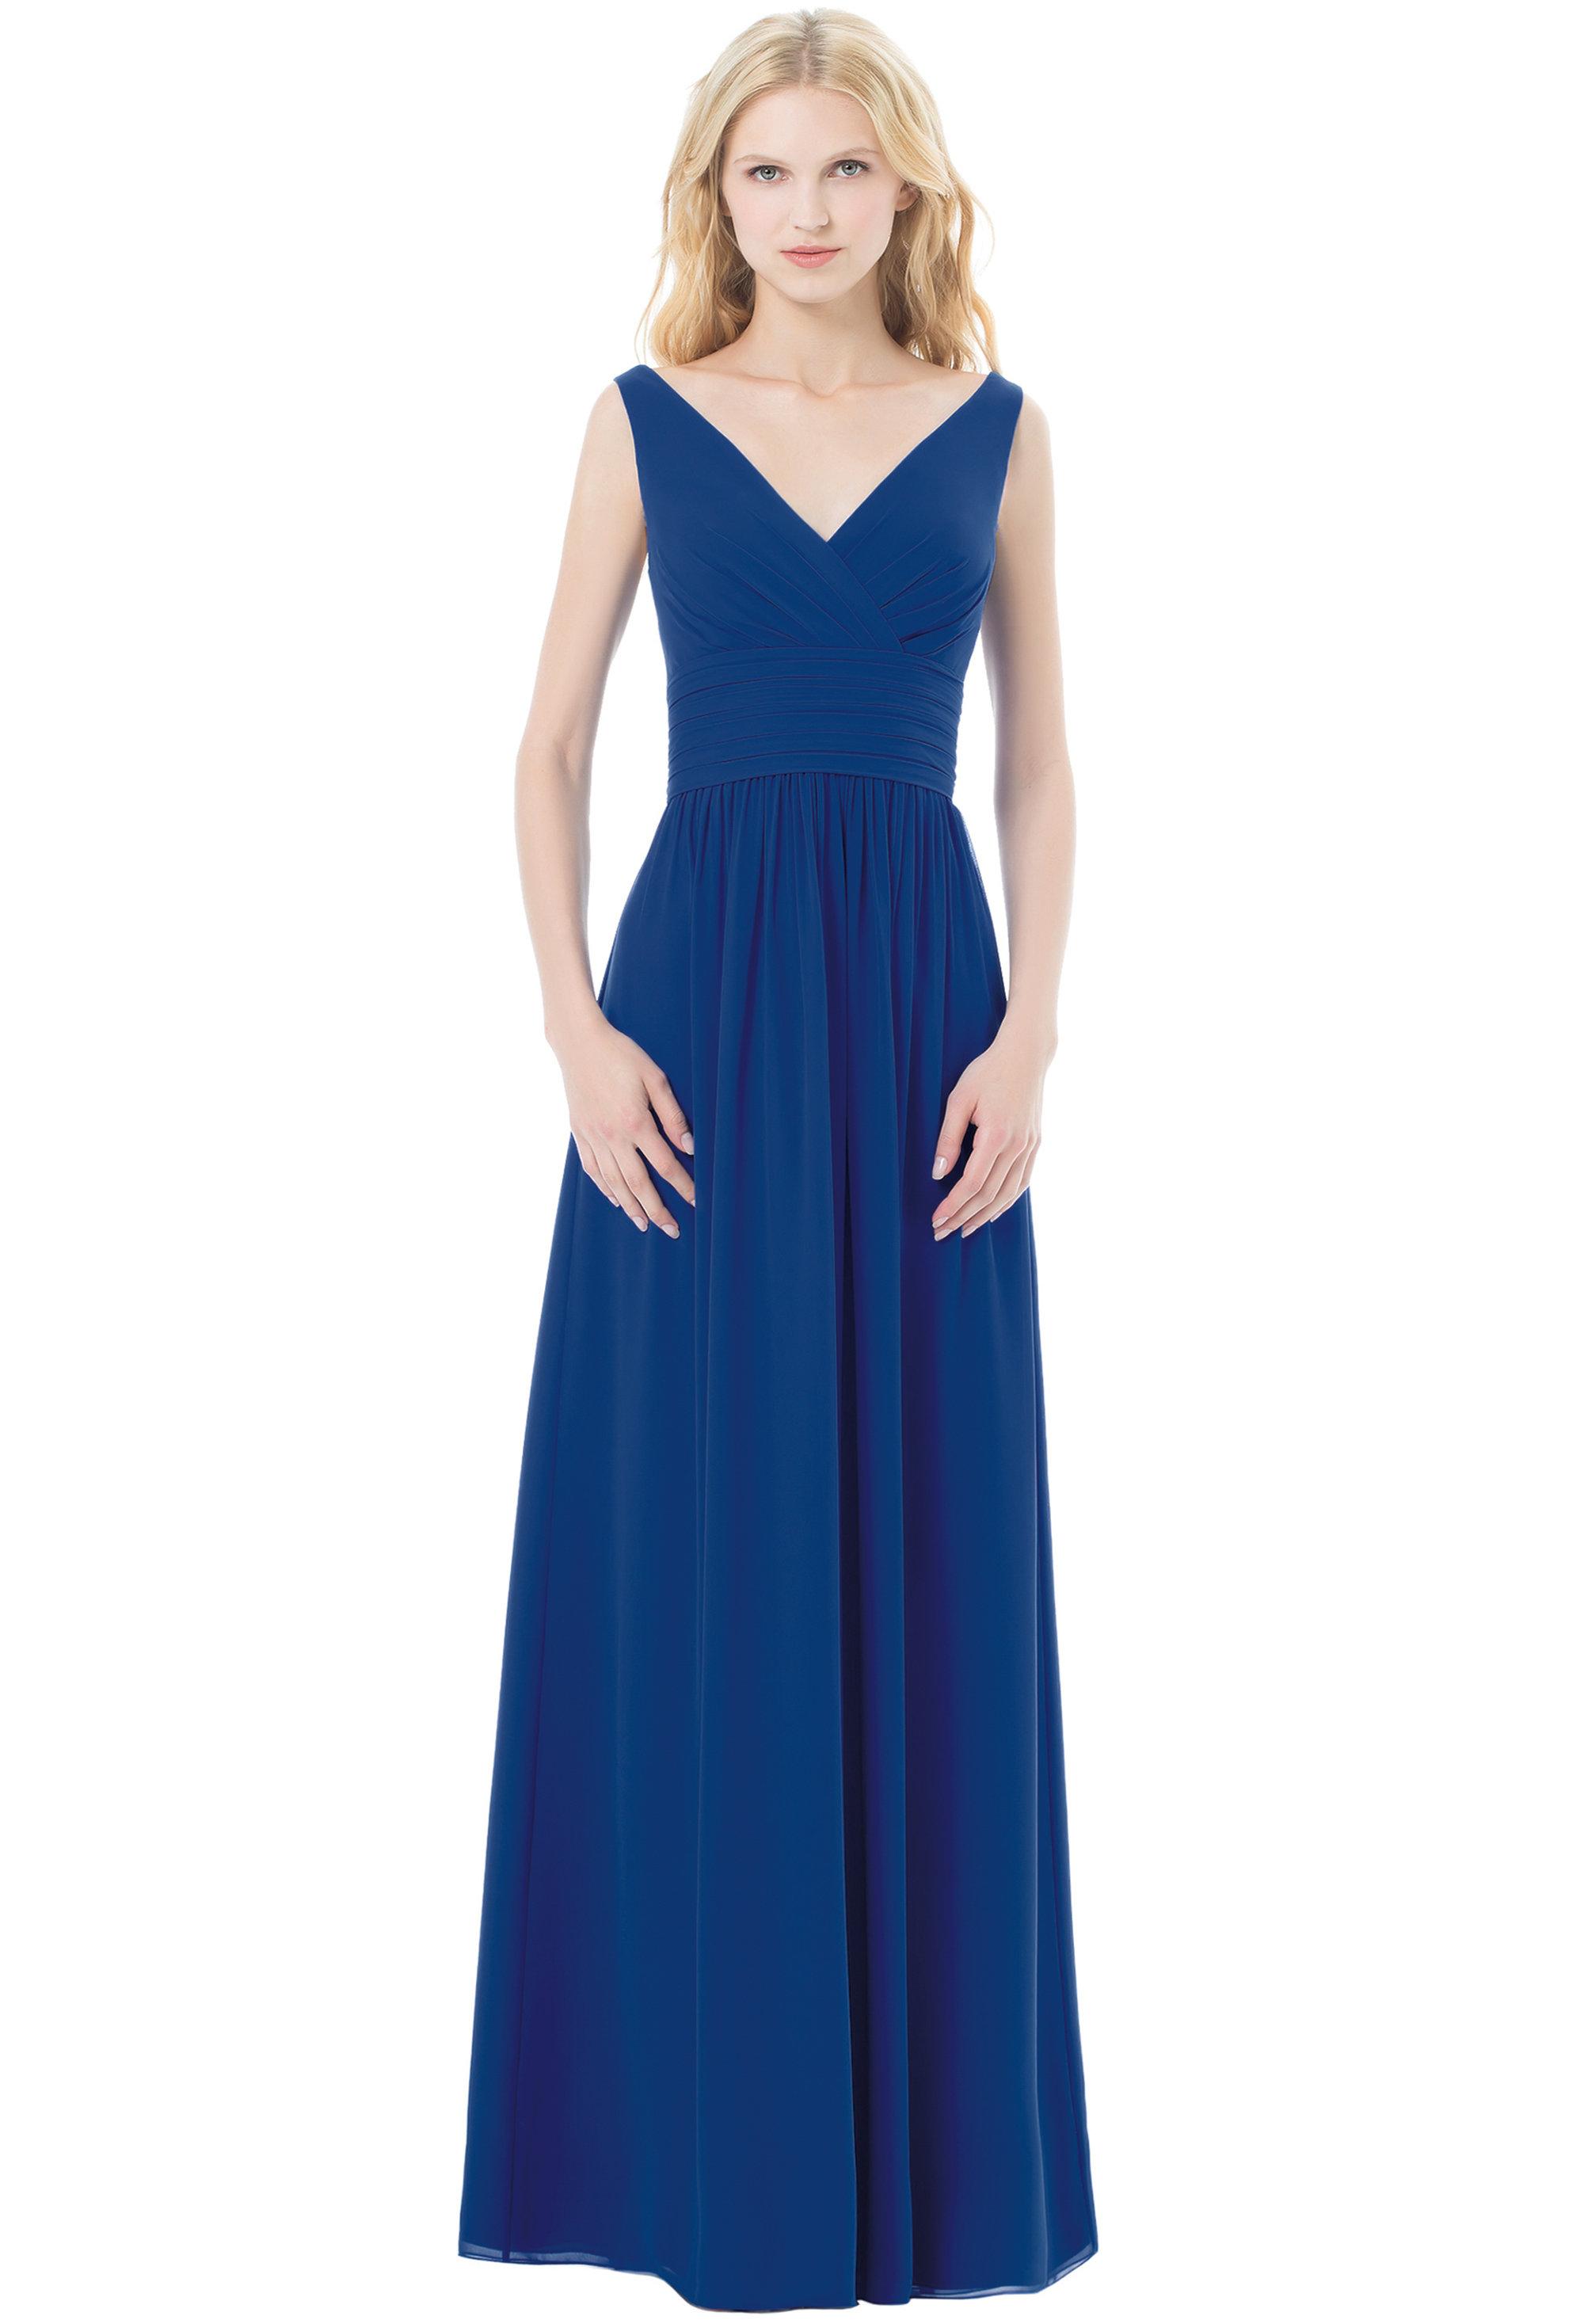 Bill Levkoff HORIZON Chiffon Sleeveless A-line gown, $220.00 Front